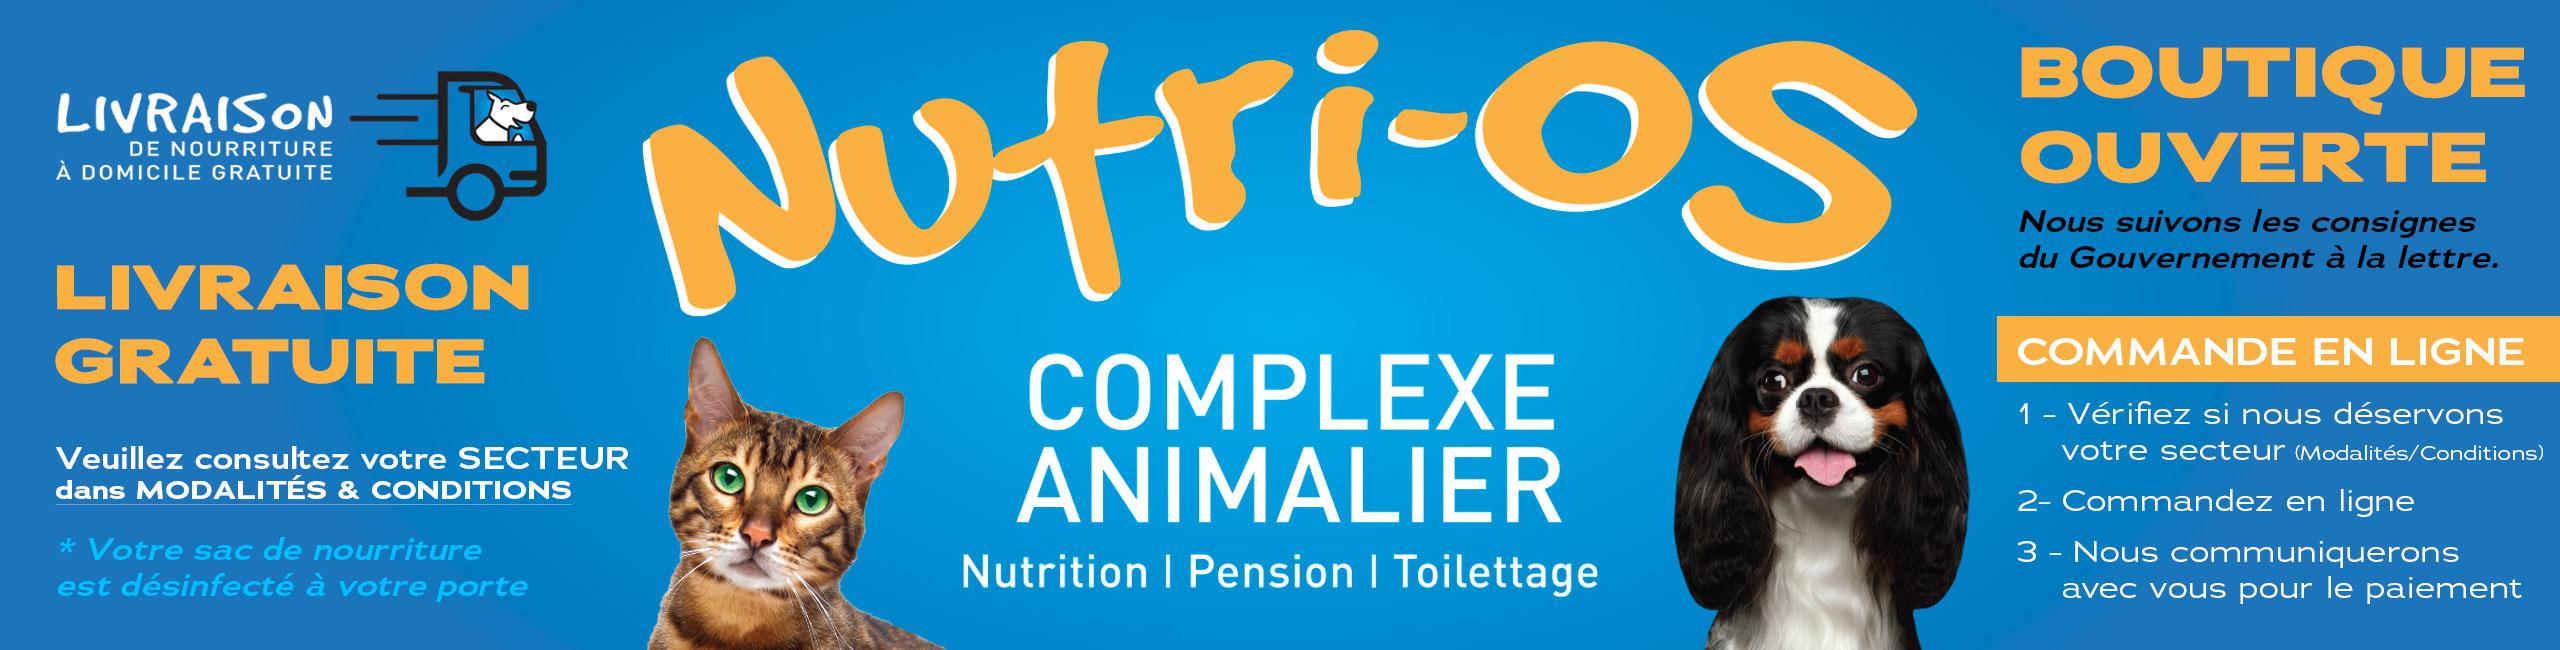 Nutri-Os Complexe Animalier